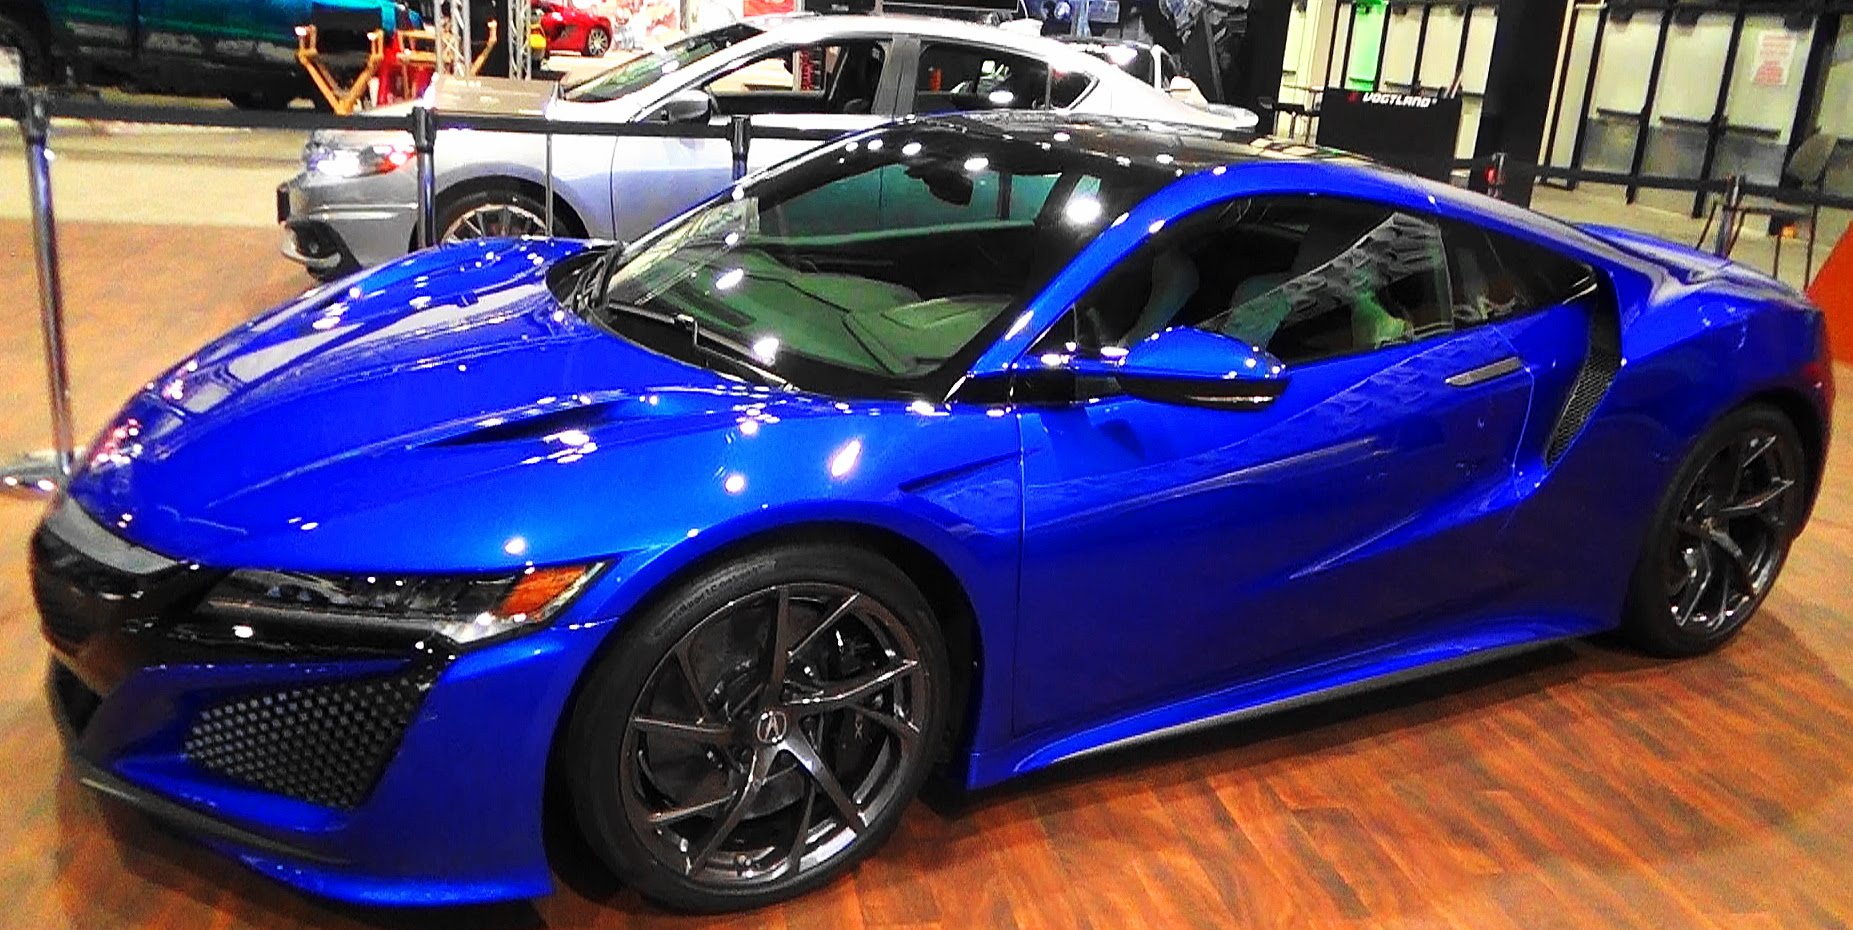 Acura Nsx Sema 2015 Scottiedtv Coolest Cars On The Web